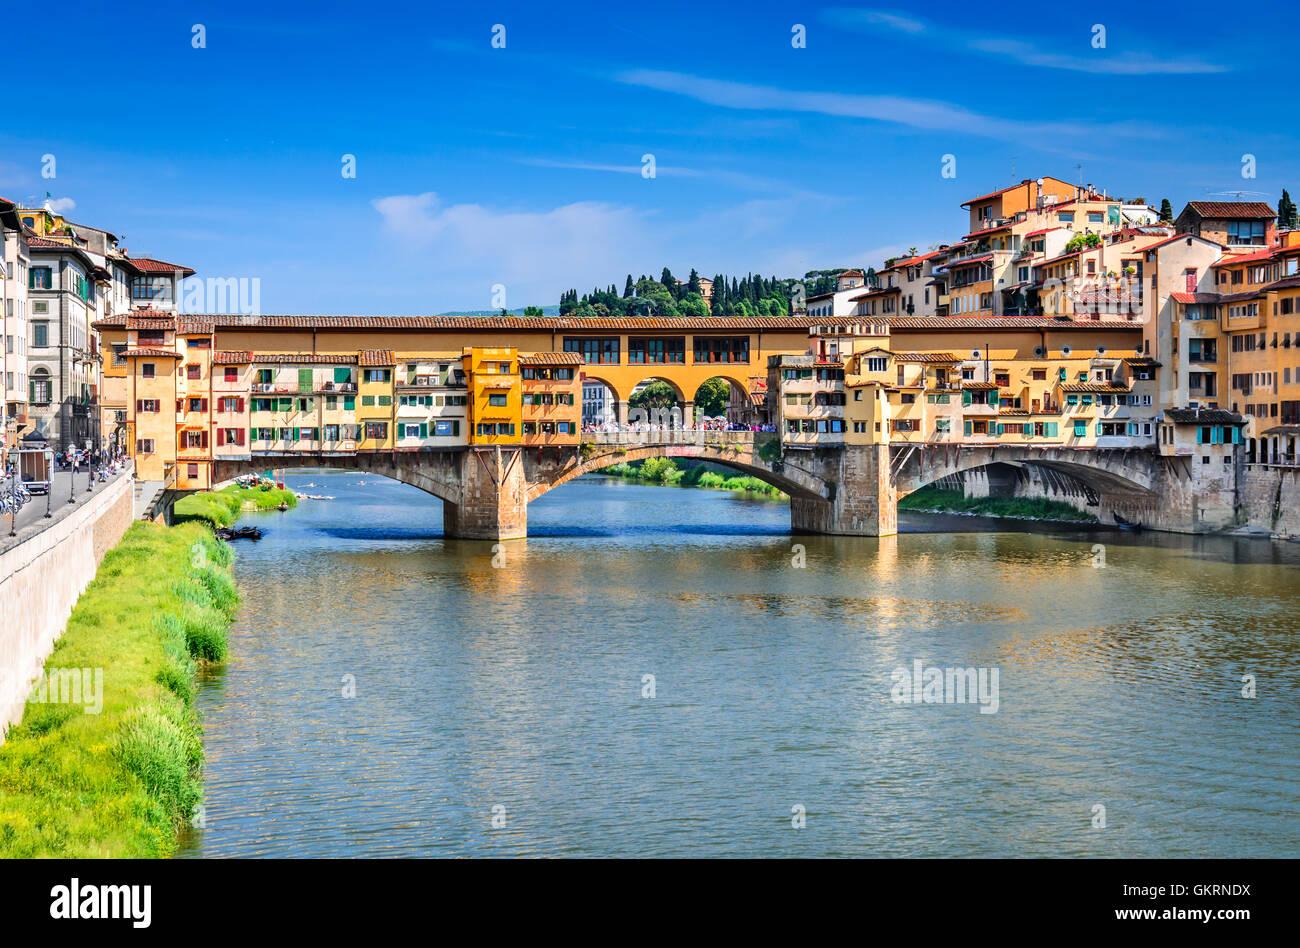 Florence, Italy. River Arno and famous bridge Ponte Vecchio at sunset (Italian: Firenze, Toscana). - Stock Image